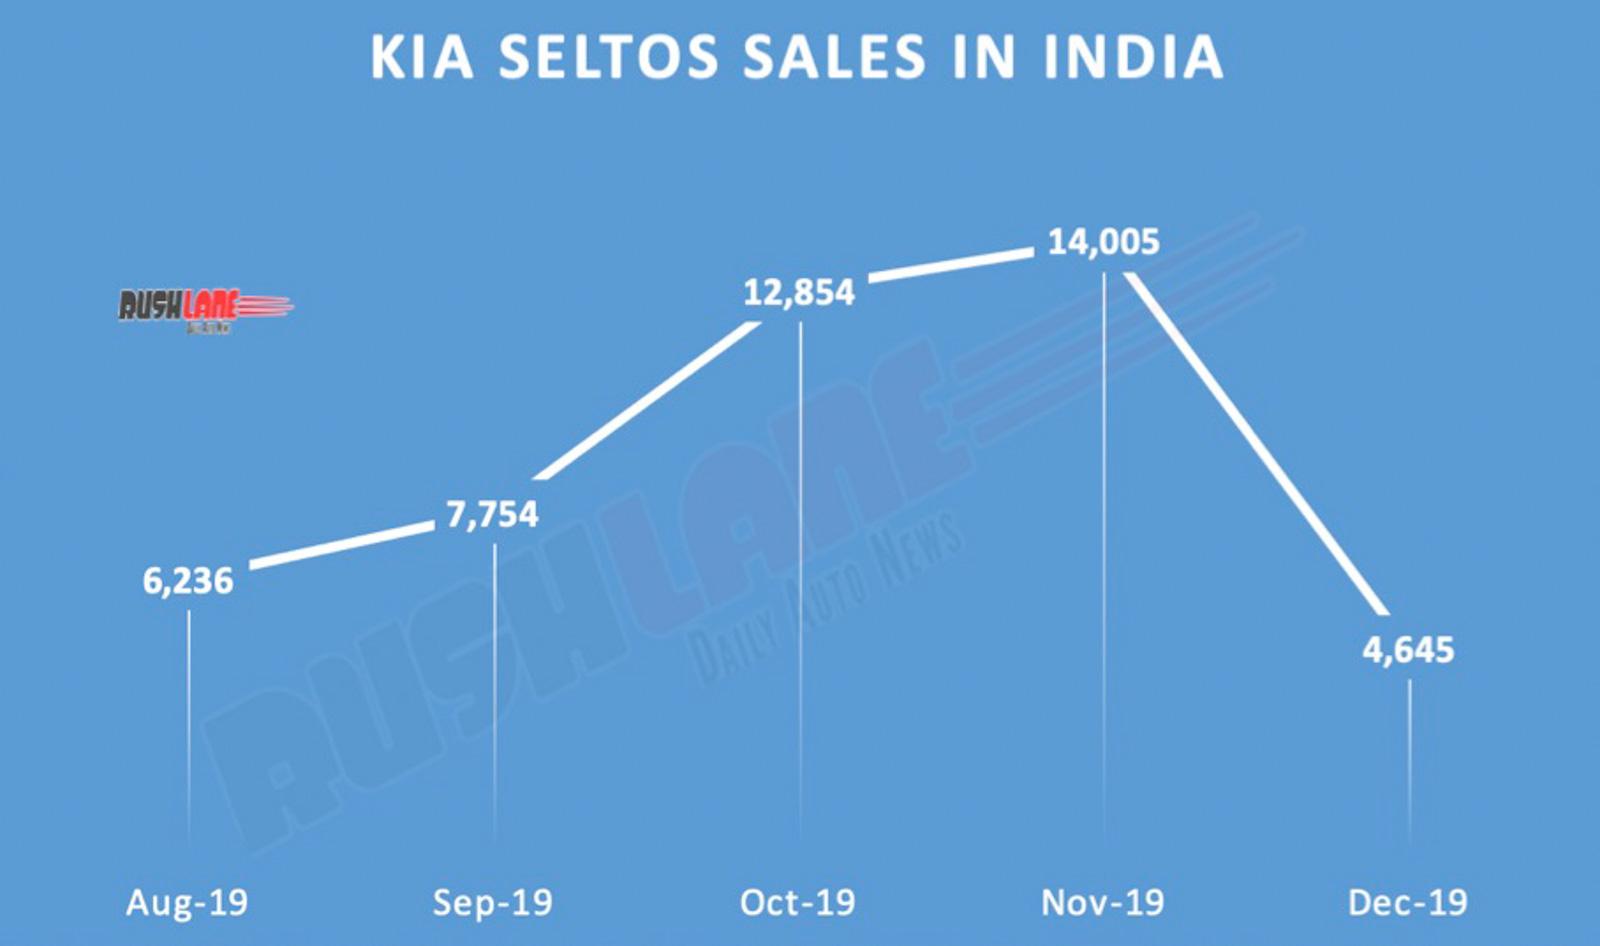 Kia Seltos sales decline